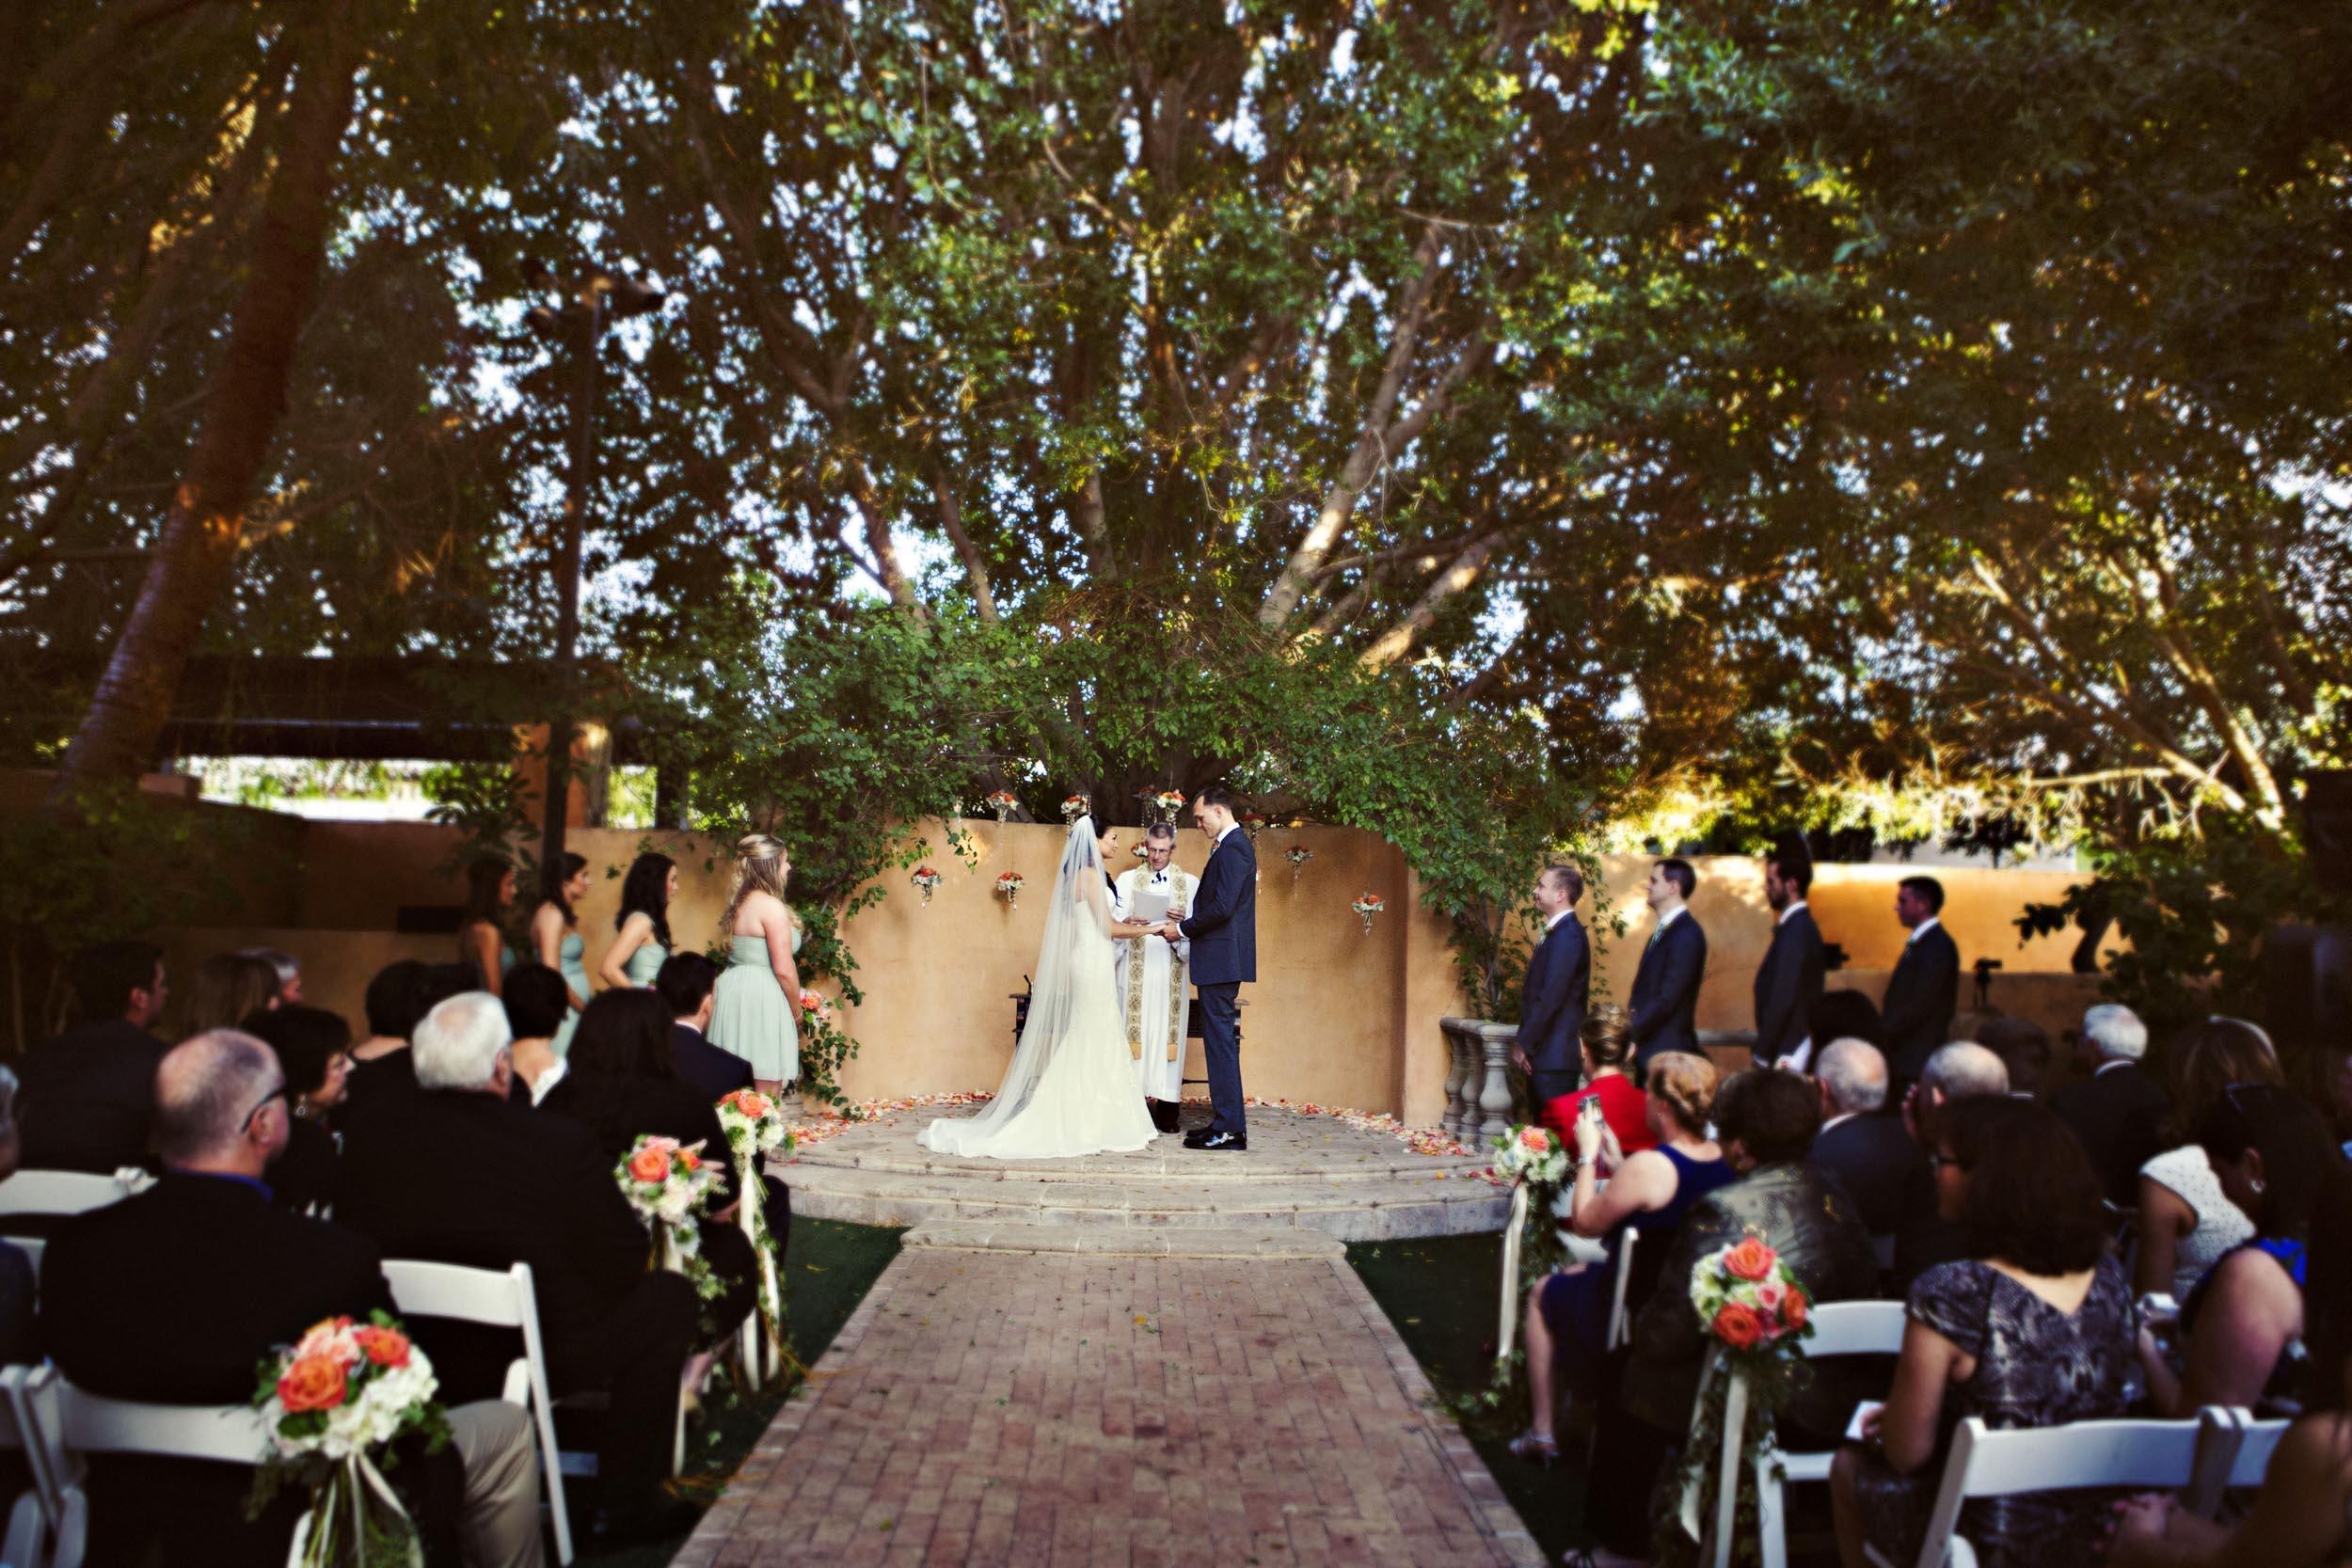 weddings-royalpalms-12.jpg